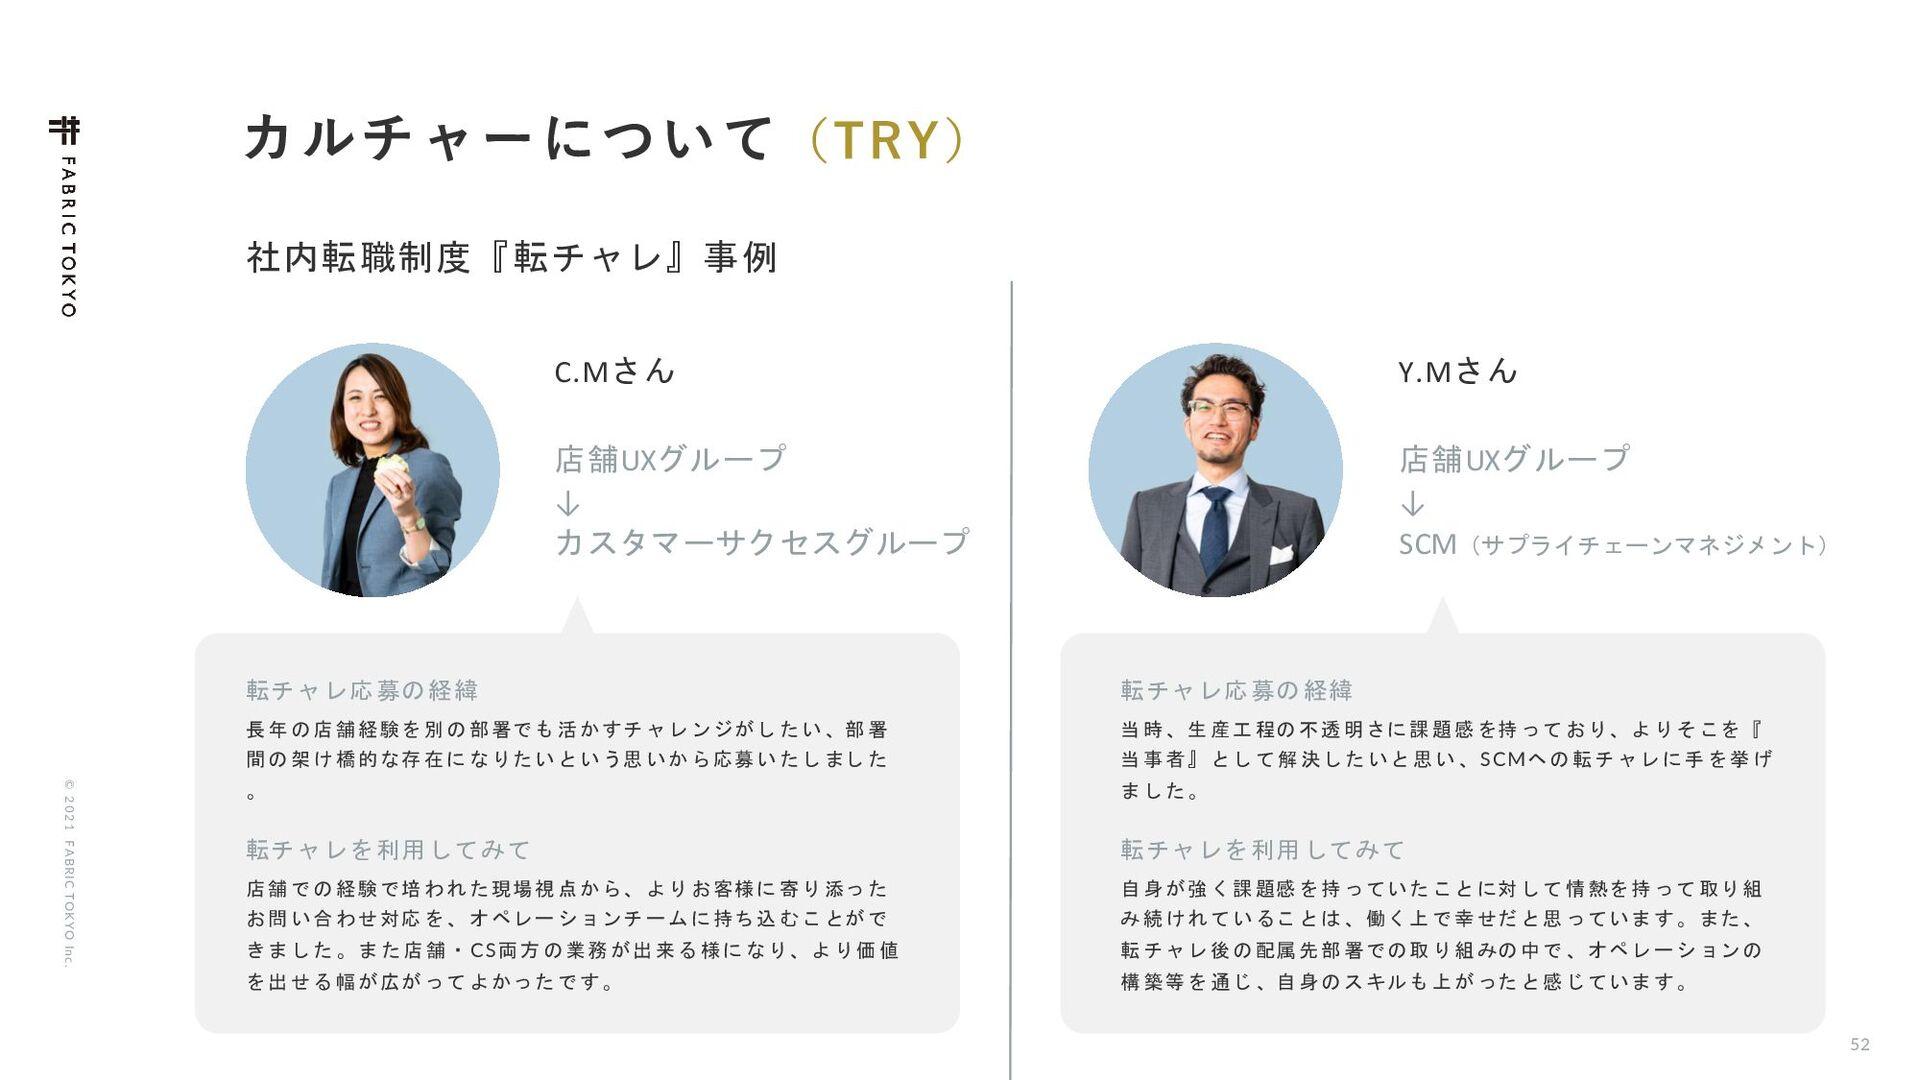 © 2021 FABRIC TOKYO Inc. 50 αϒεΫϦϓγϣϯ Ϧςʔϧϒϥϯυ ...